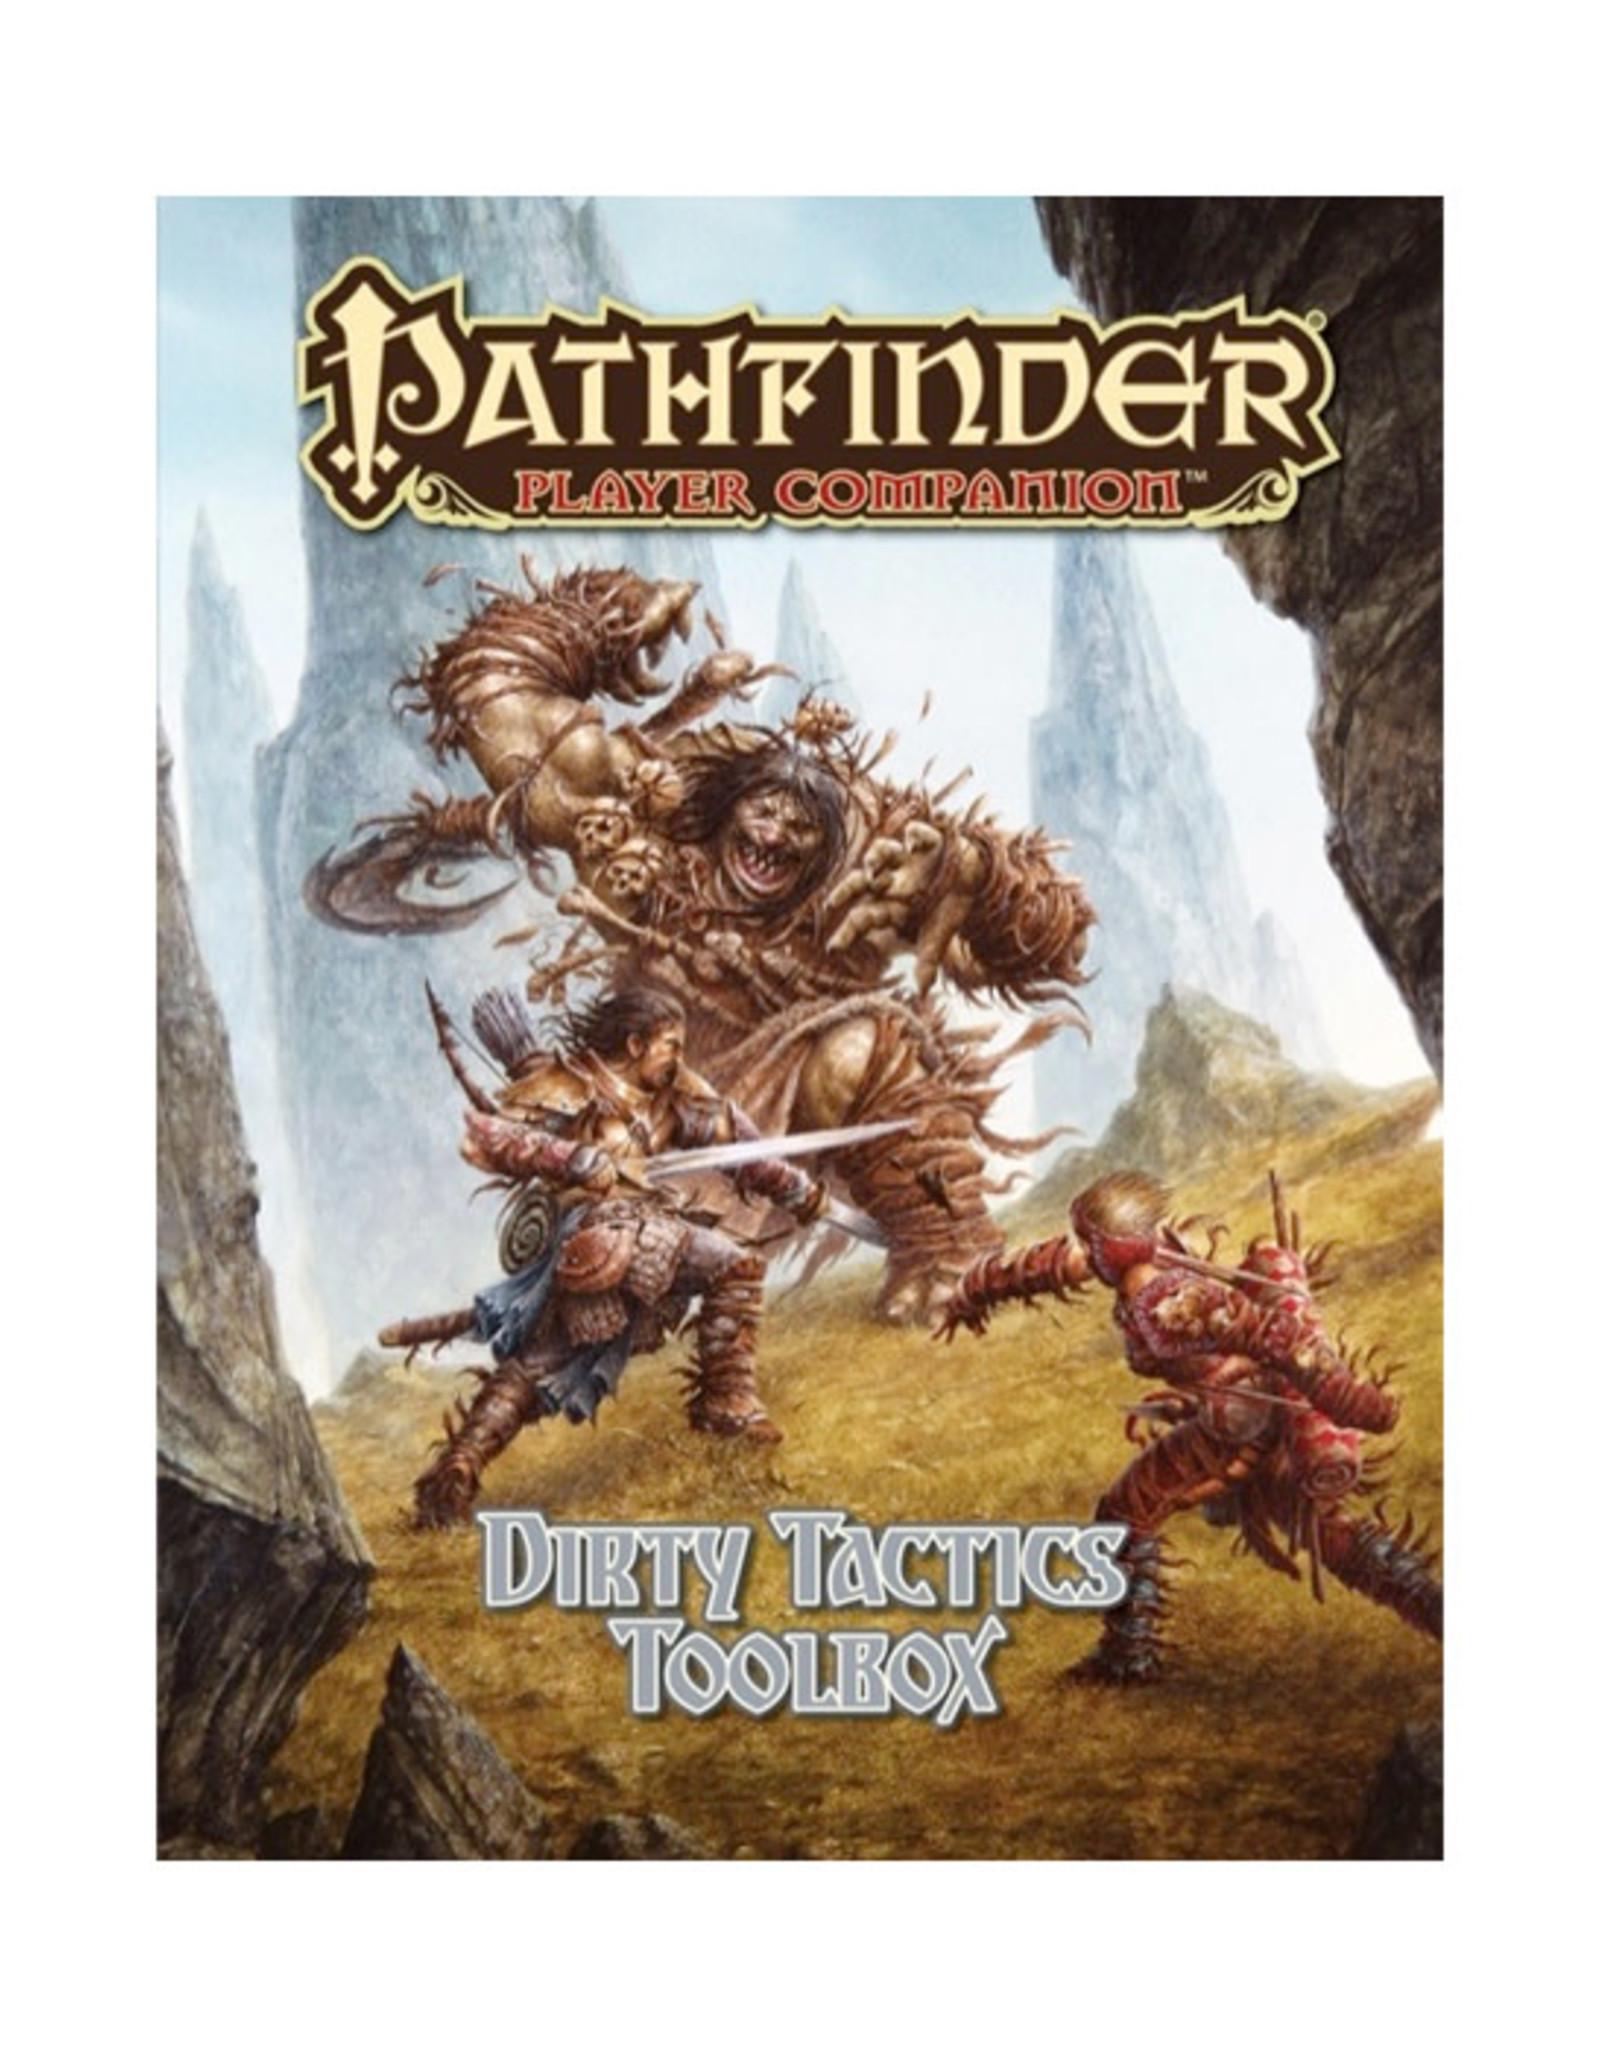 Pathfinder Pathfinder: Player Companion - Dirty Tactics Toolbox